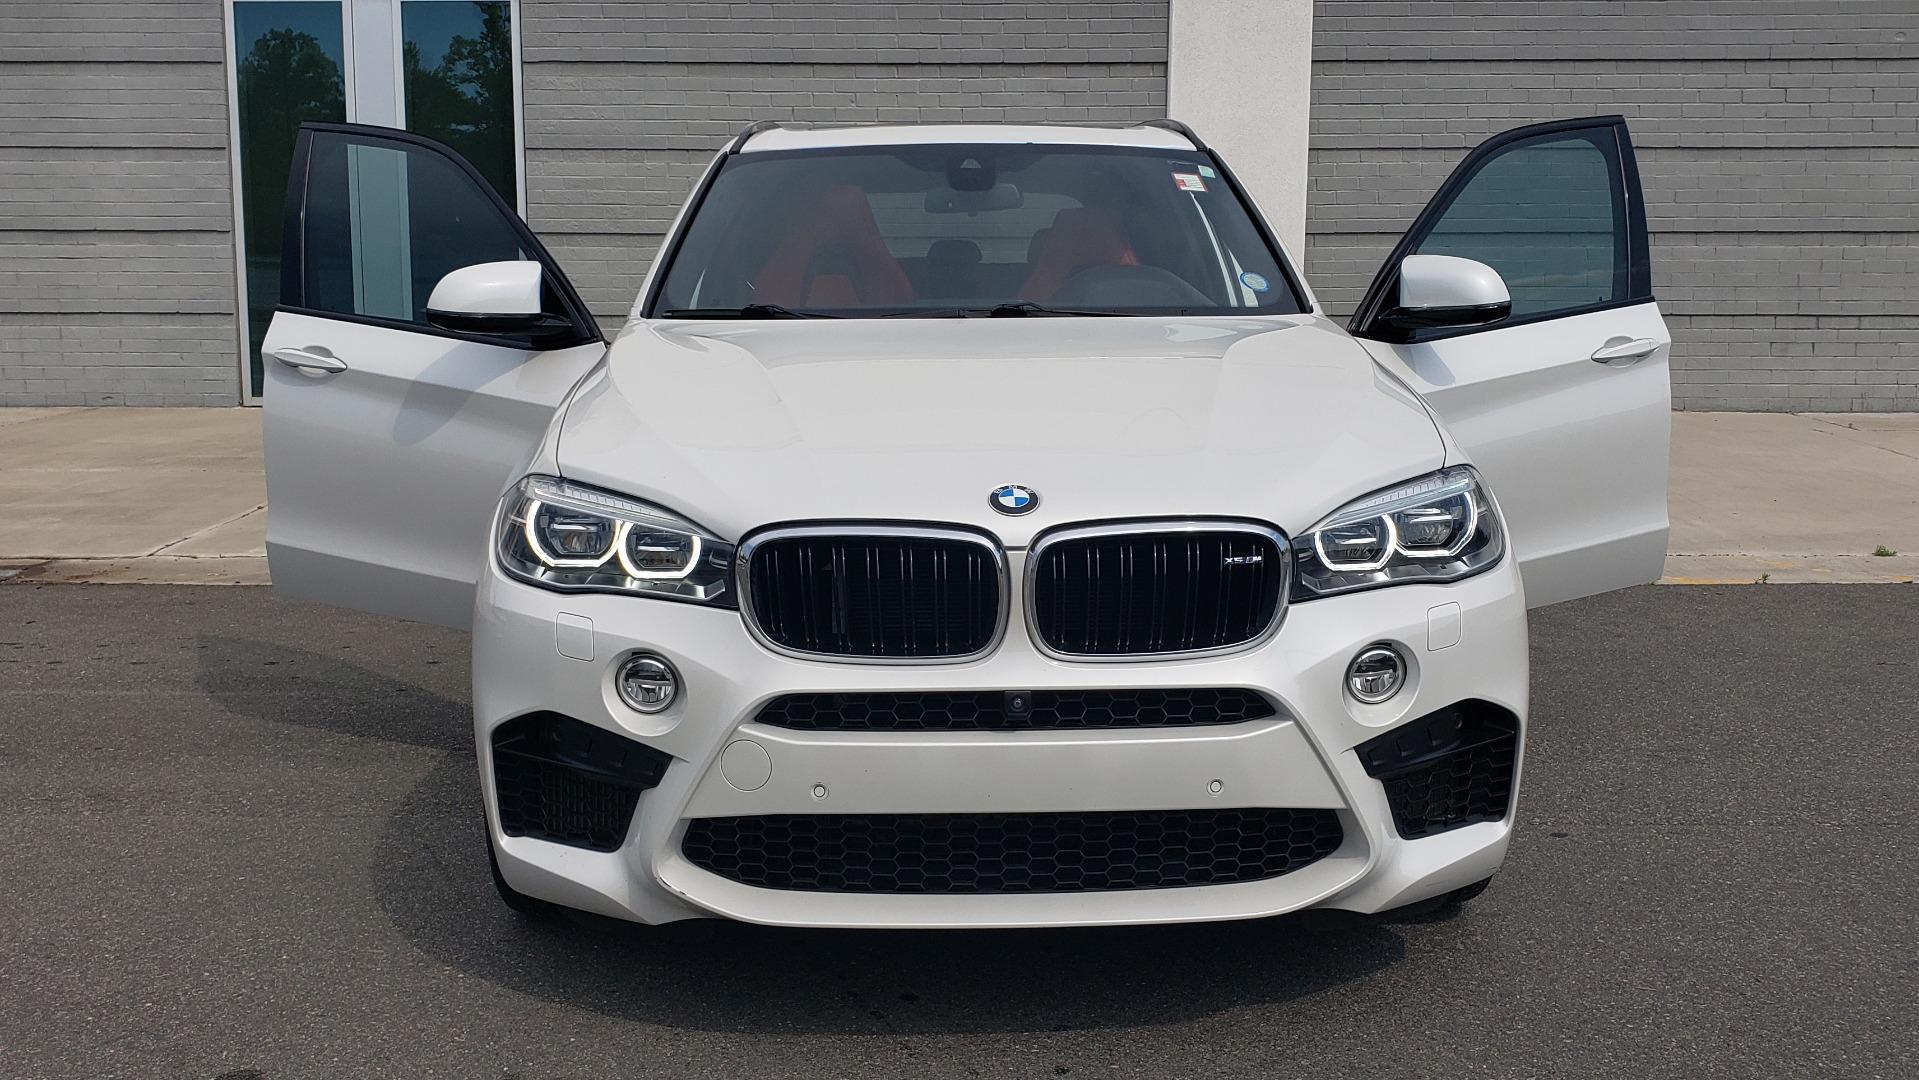 Used 2017 BMW X5 M EXECUTIVE PKG / NAV / DRVR ASST / BSM / HUD / HTD STS / WIFI for sale Sold at Formula Imports in Charlotte NC 28227 22